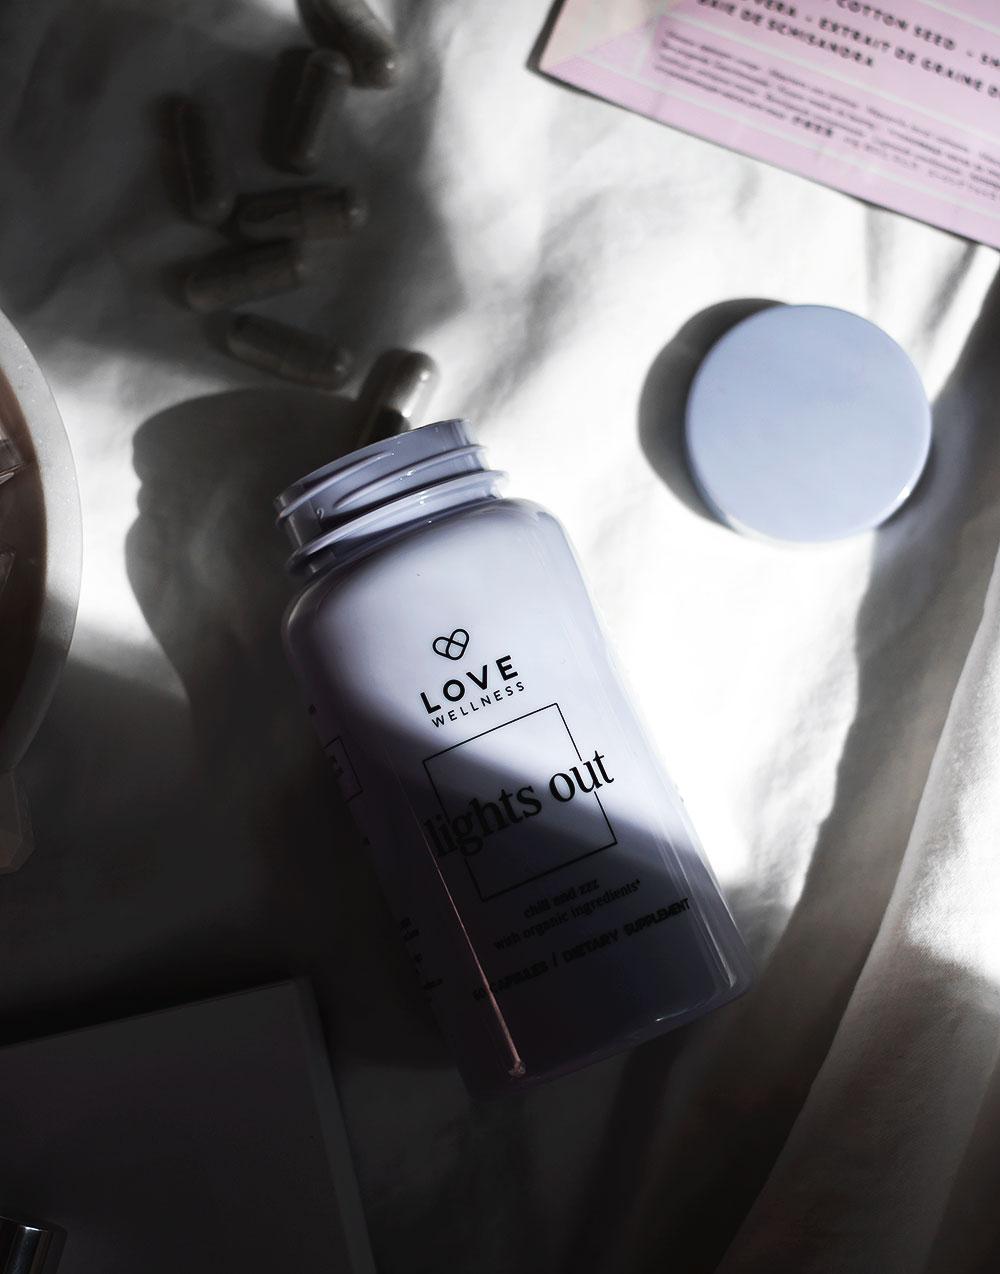 Beauty Sleep Products Love Wellness Lights Out